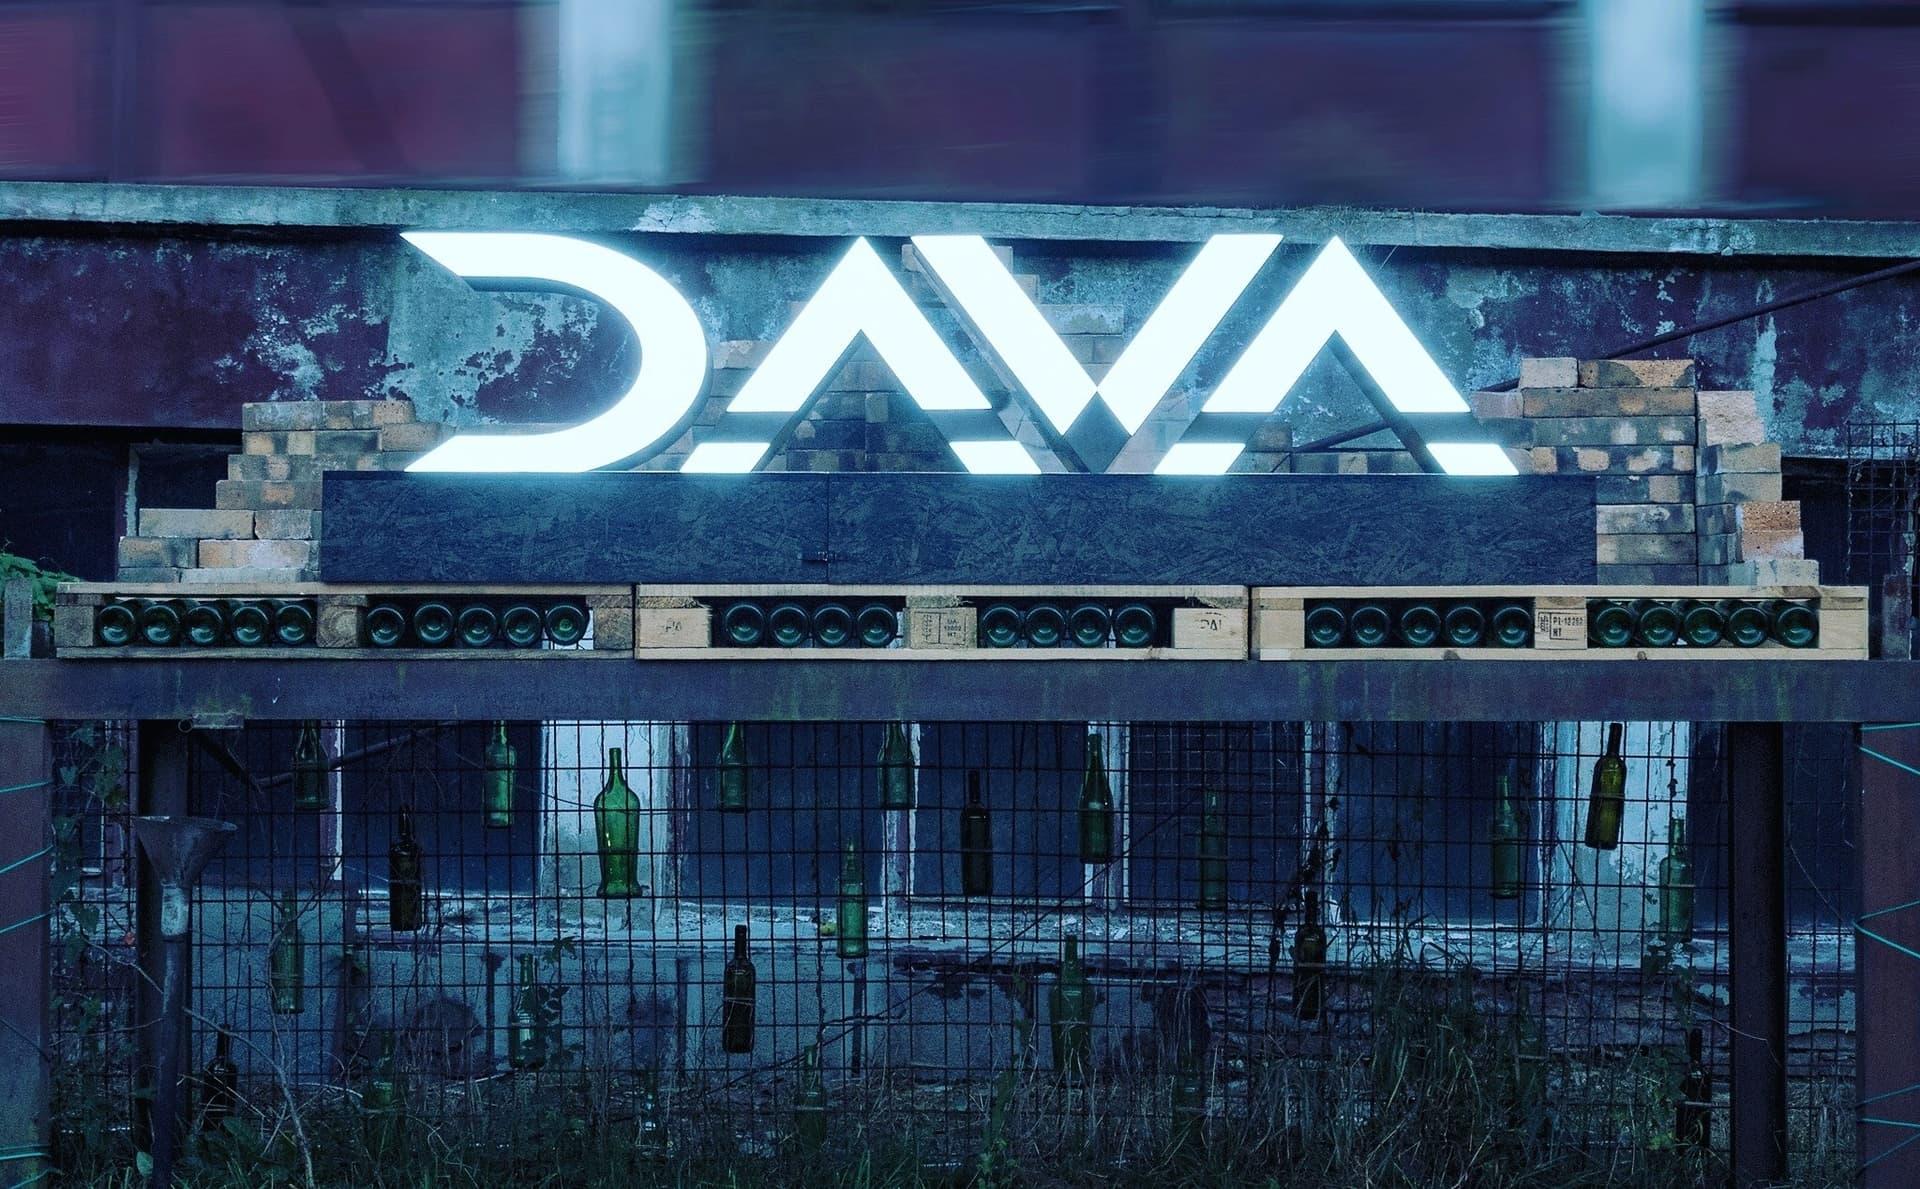 Interviu cu Victor Gavronschi, fondator Dava Festival